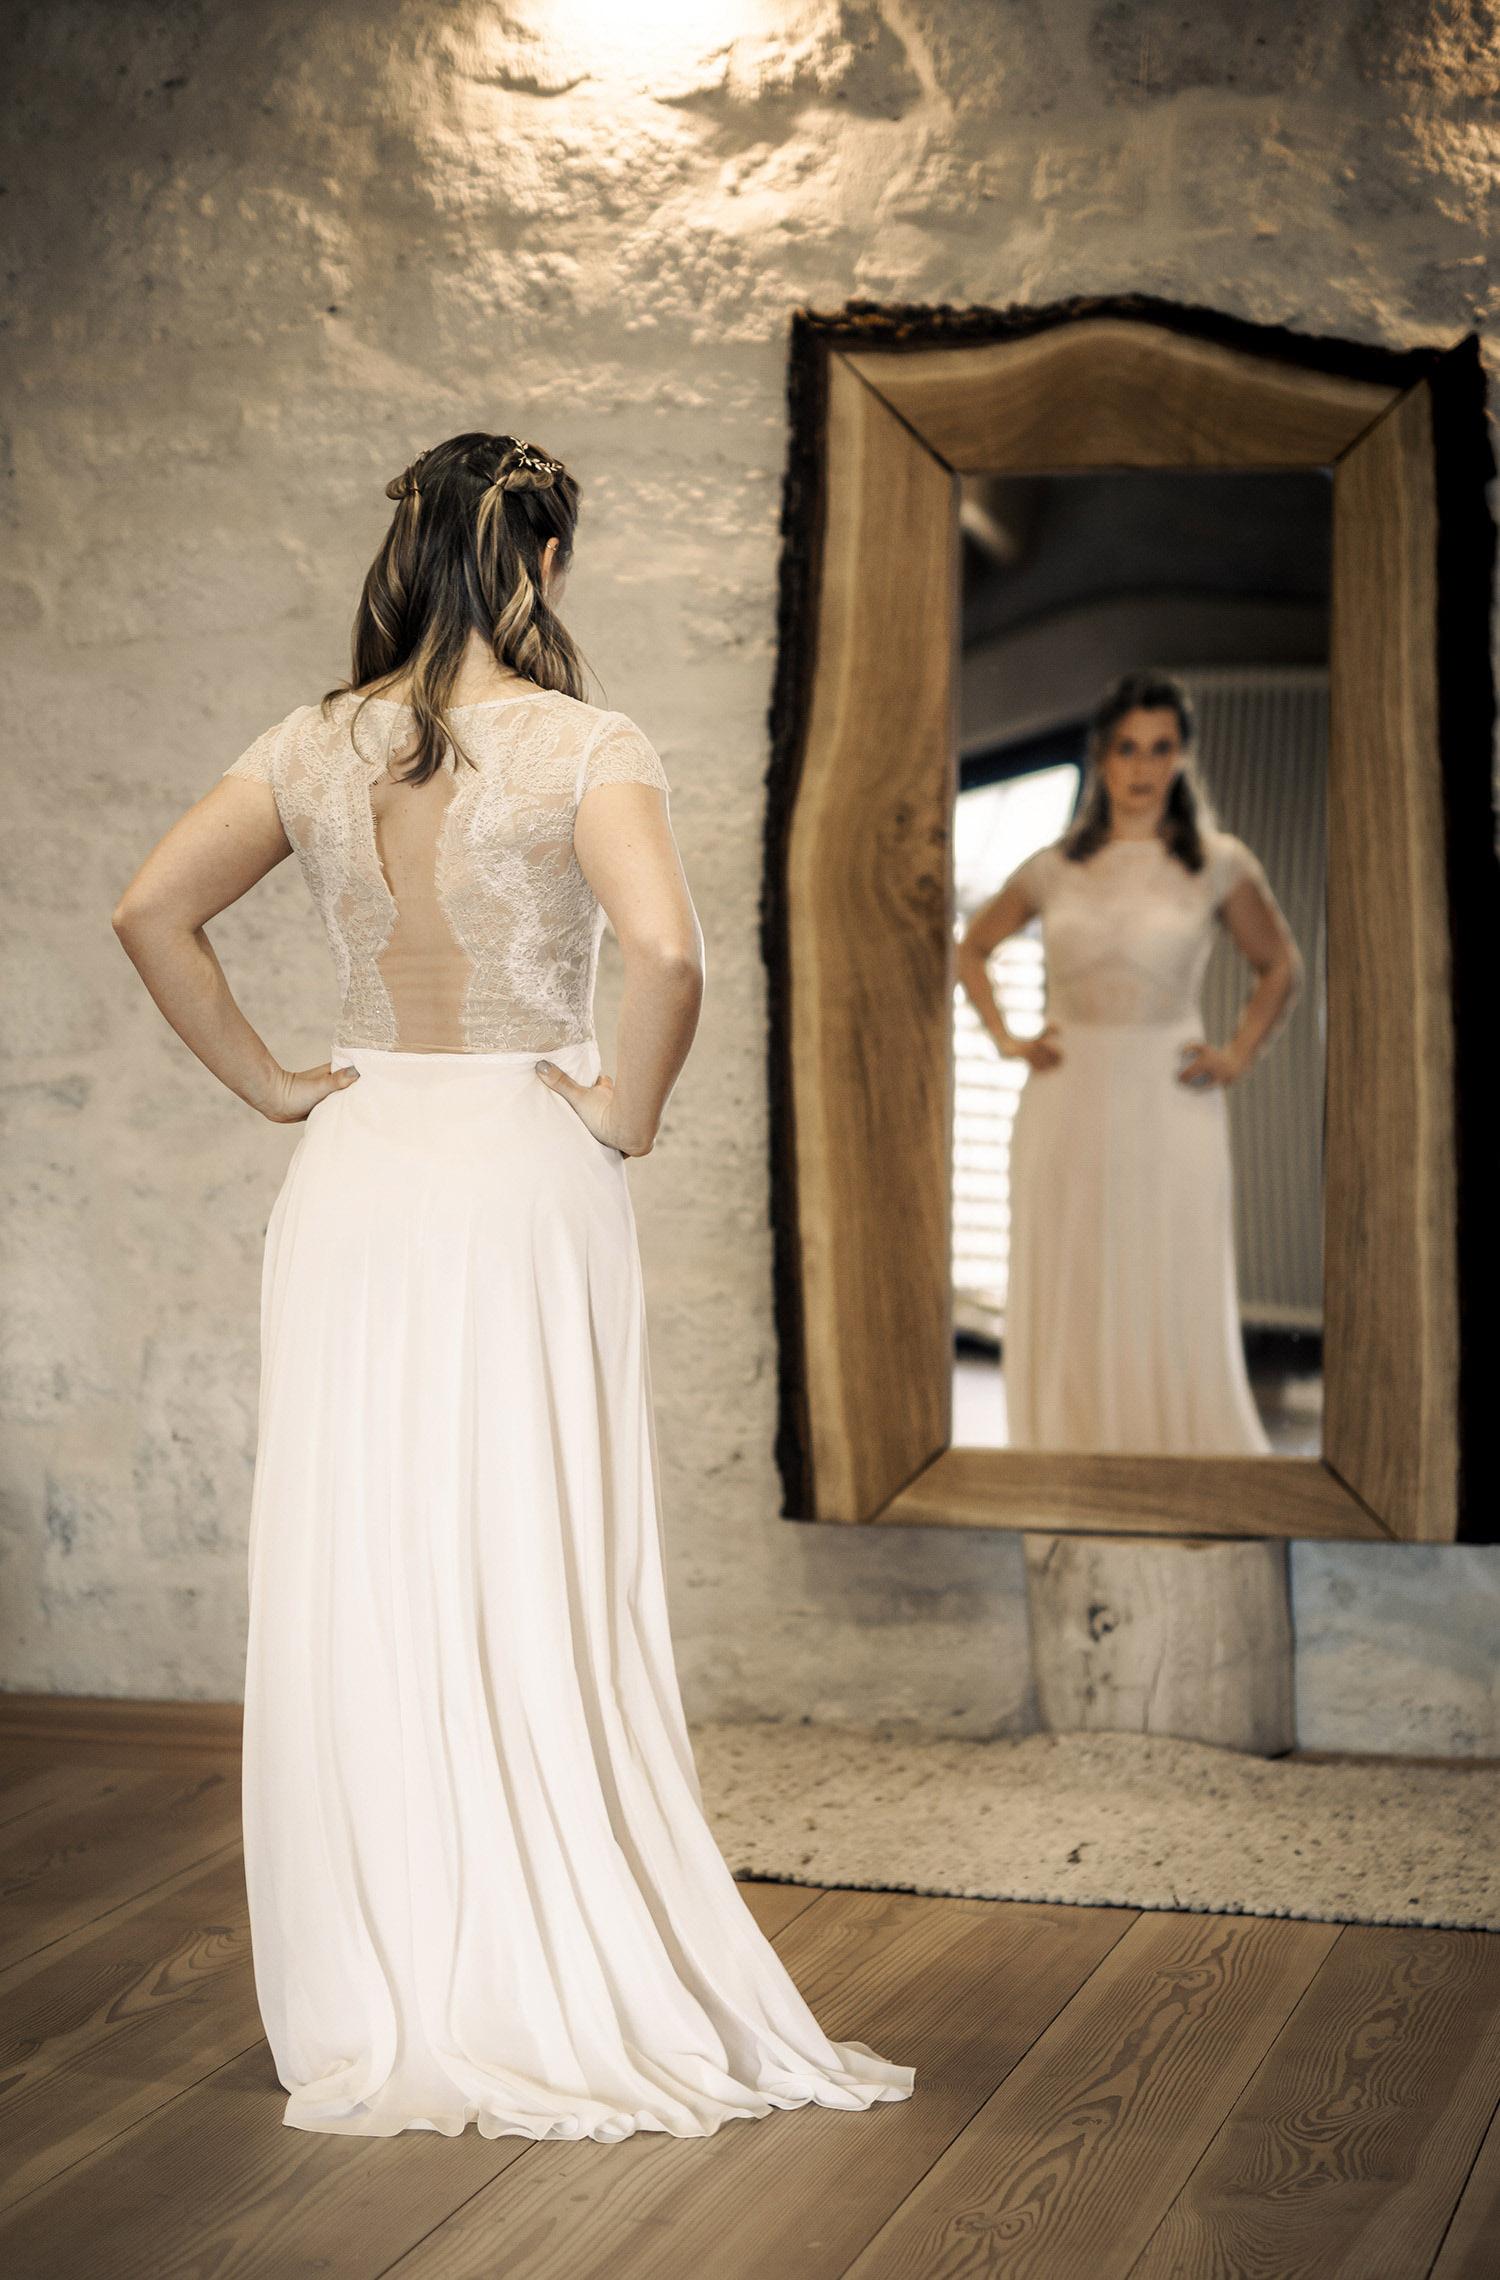 Eine Frau trägt das Fit and Flair Kleid Lesley von Therese&Luise